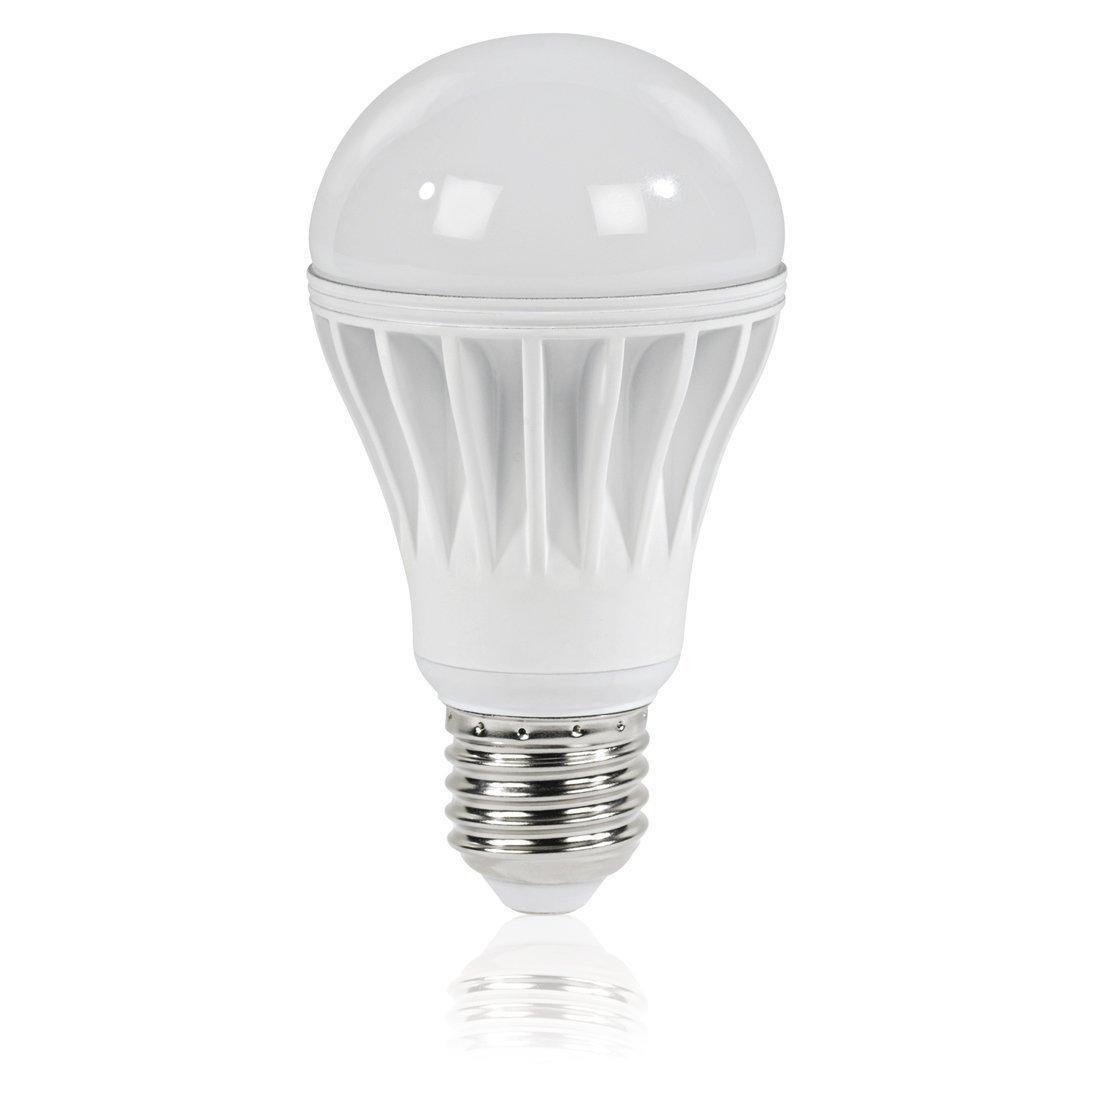 Xavax LED-Lampe E27, 11.5W (ersetzt 60W), 806 lm, Glühlampenform ...